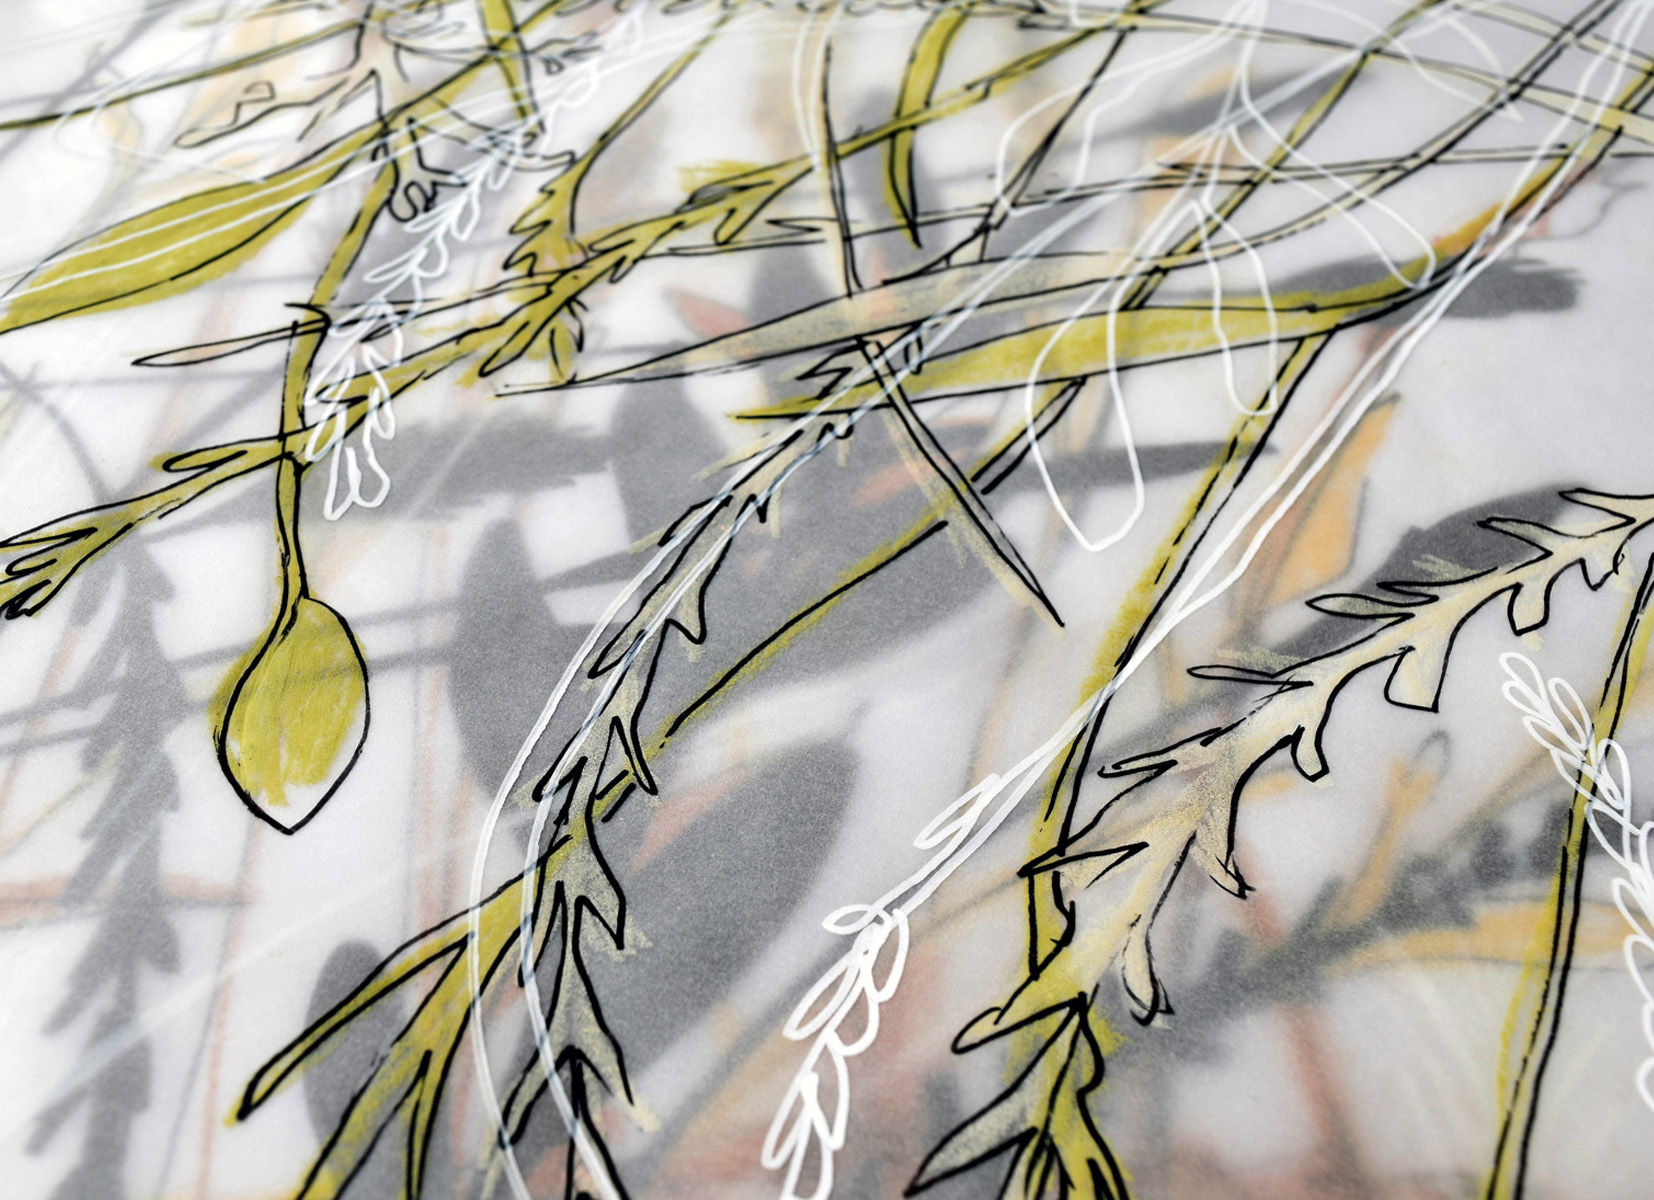 Urbanised Botanics preliminary artwork